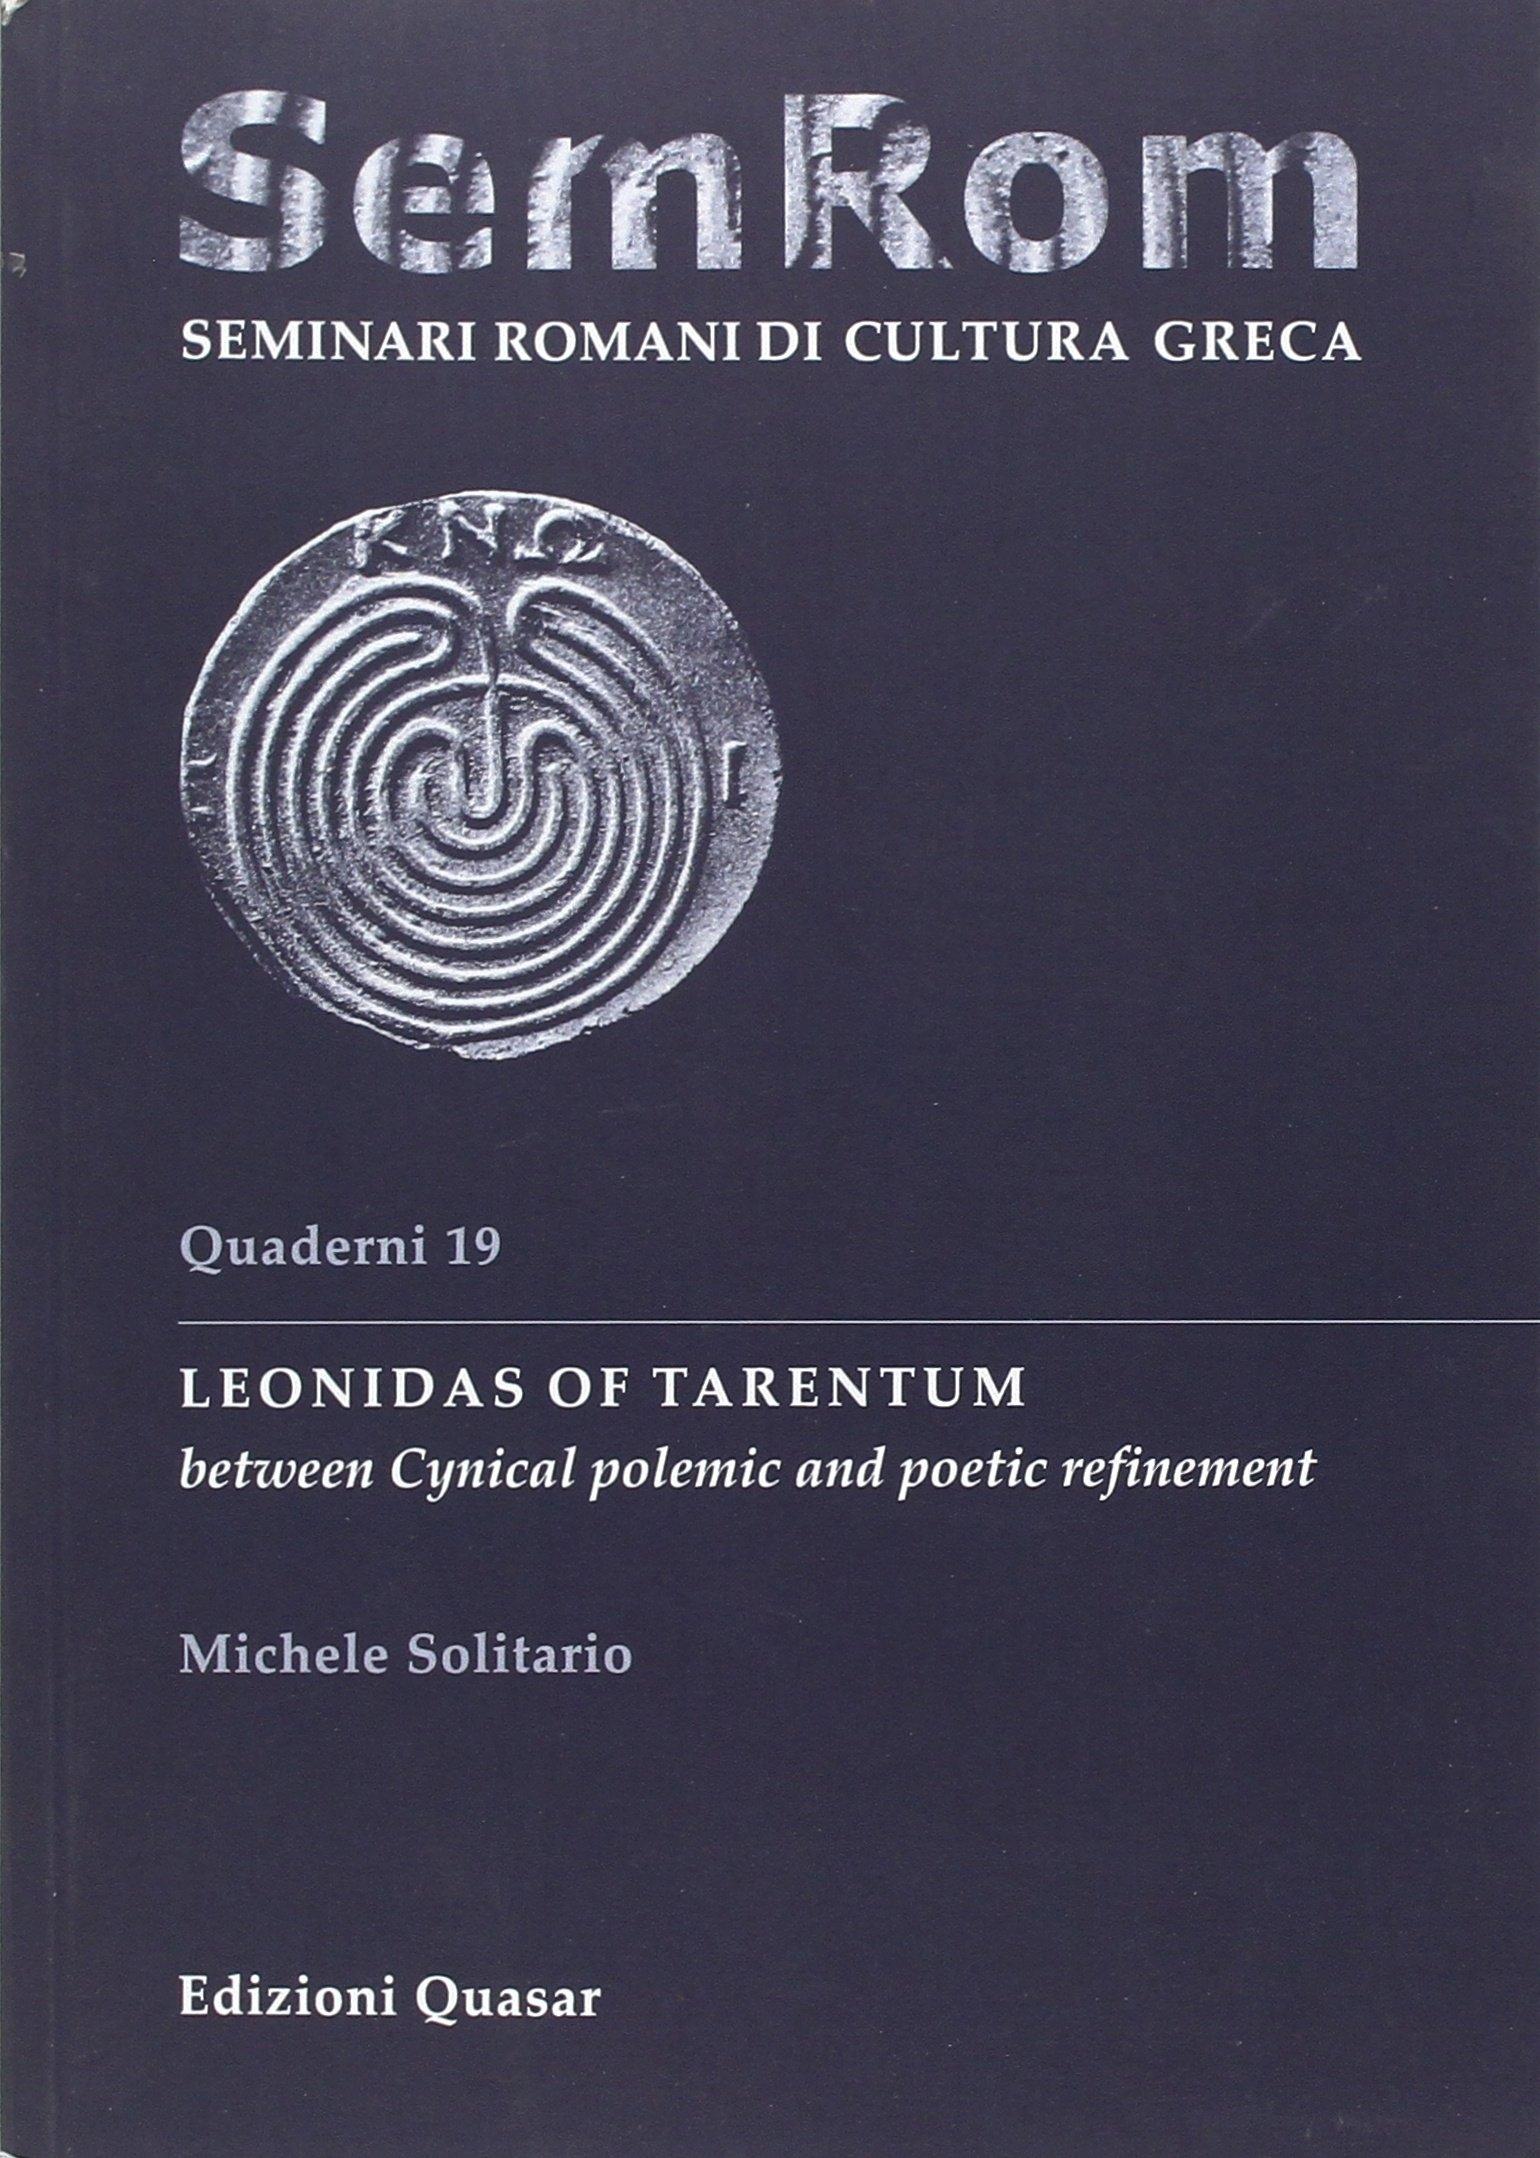 Leonidas of Tarentum Between Cynical Polemic and Poetic Refinement.